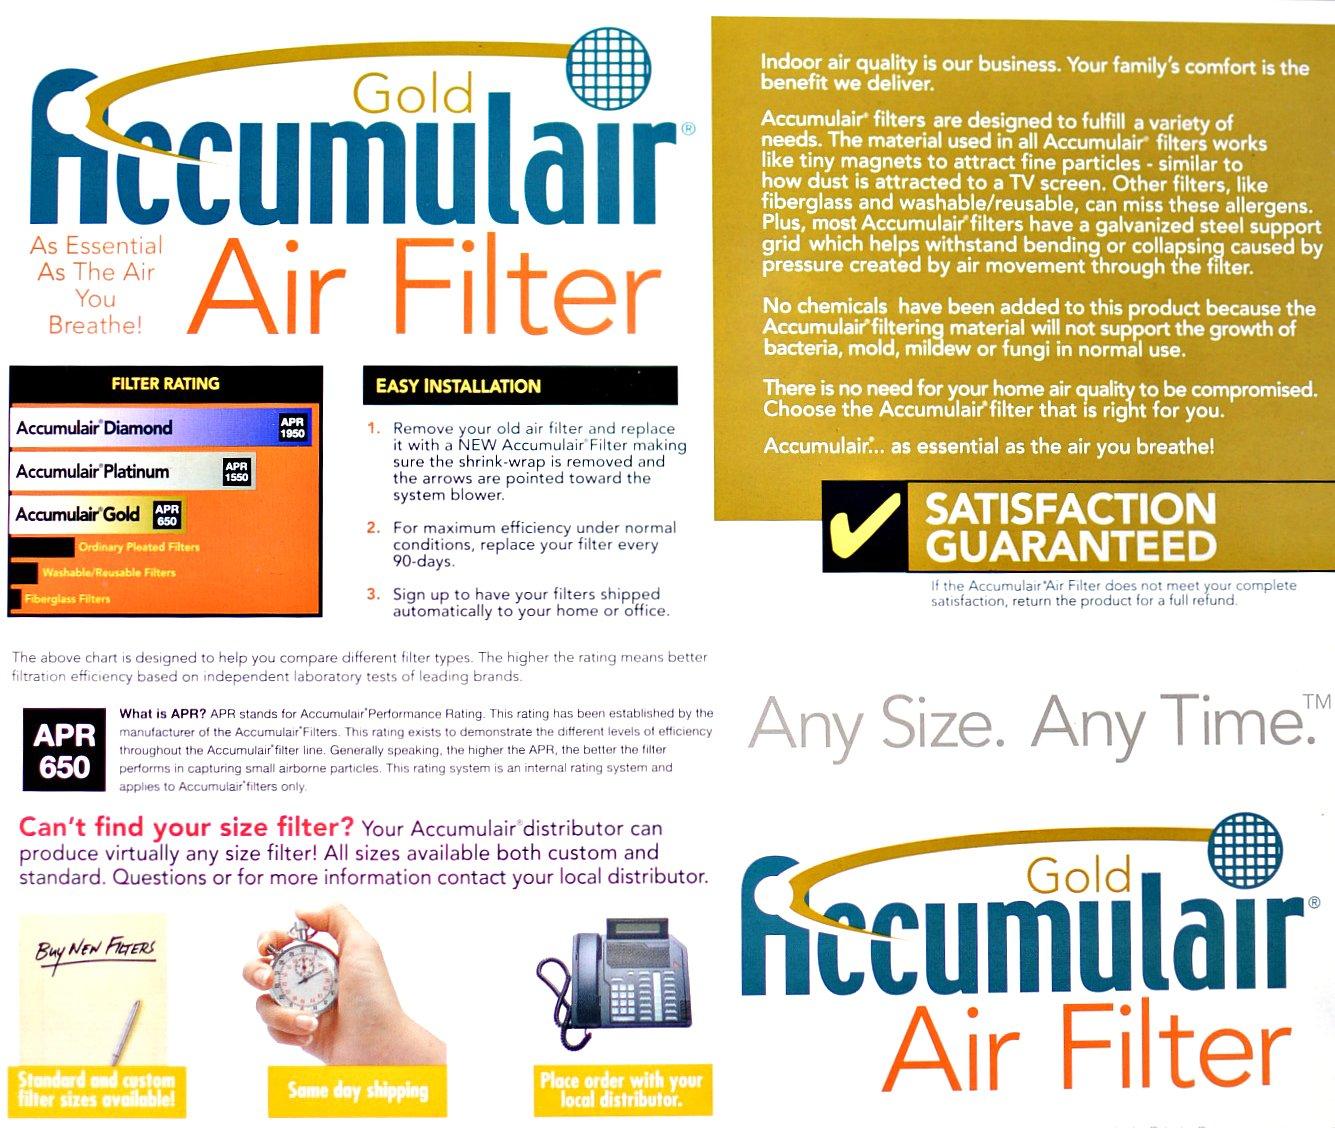 23-1//2x29-1//2 Accumulair Gold Filter MERV 8 24x30x1